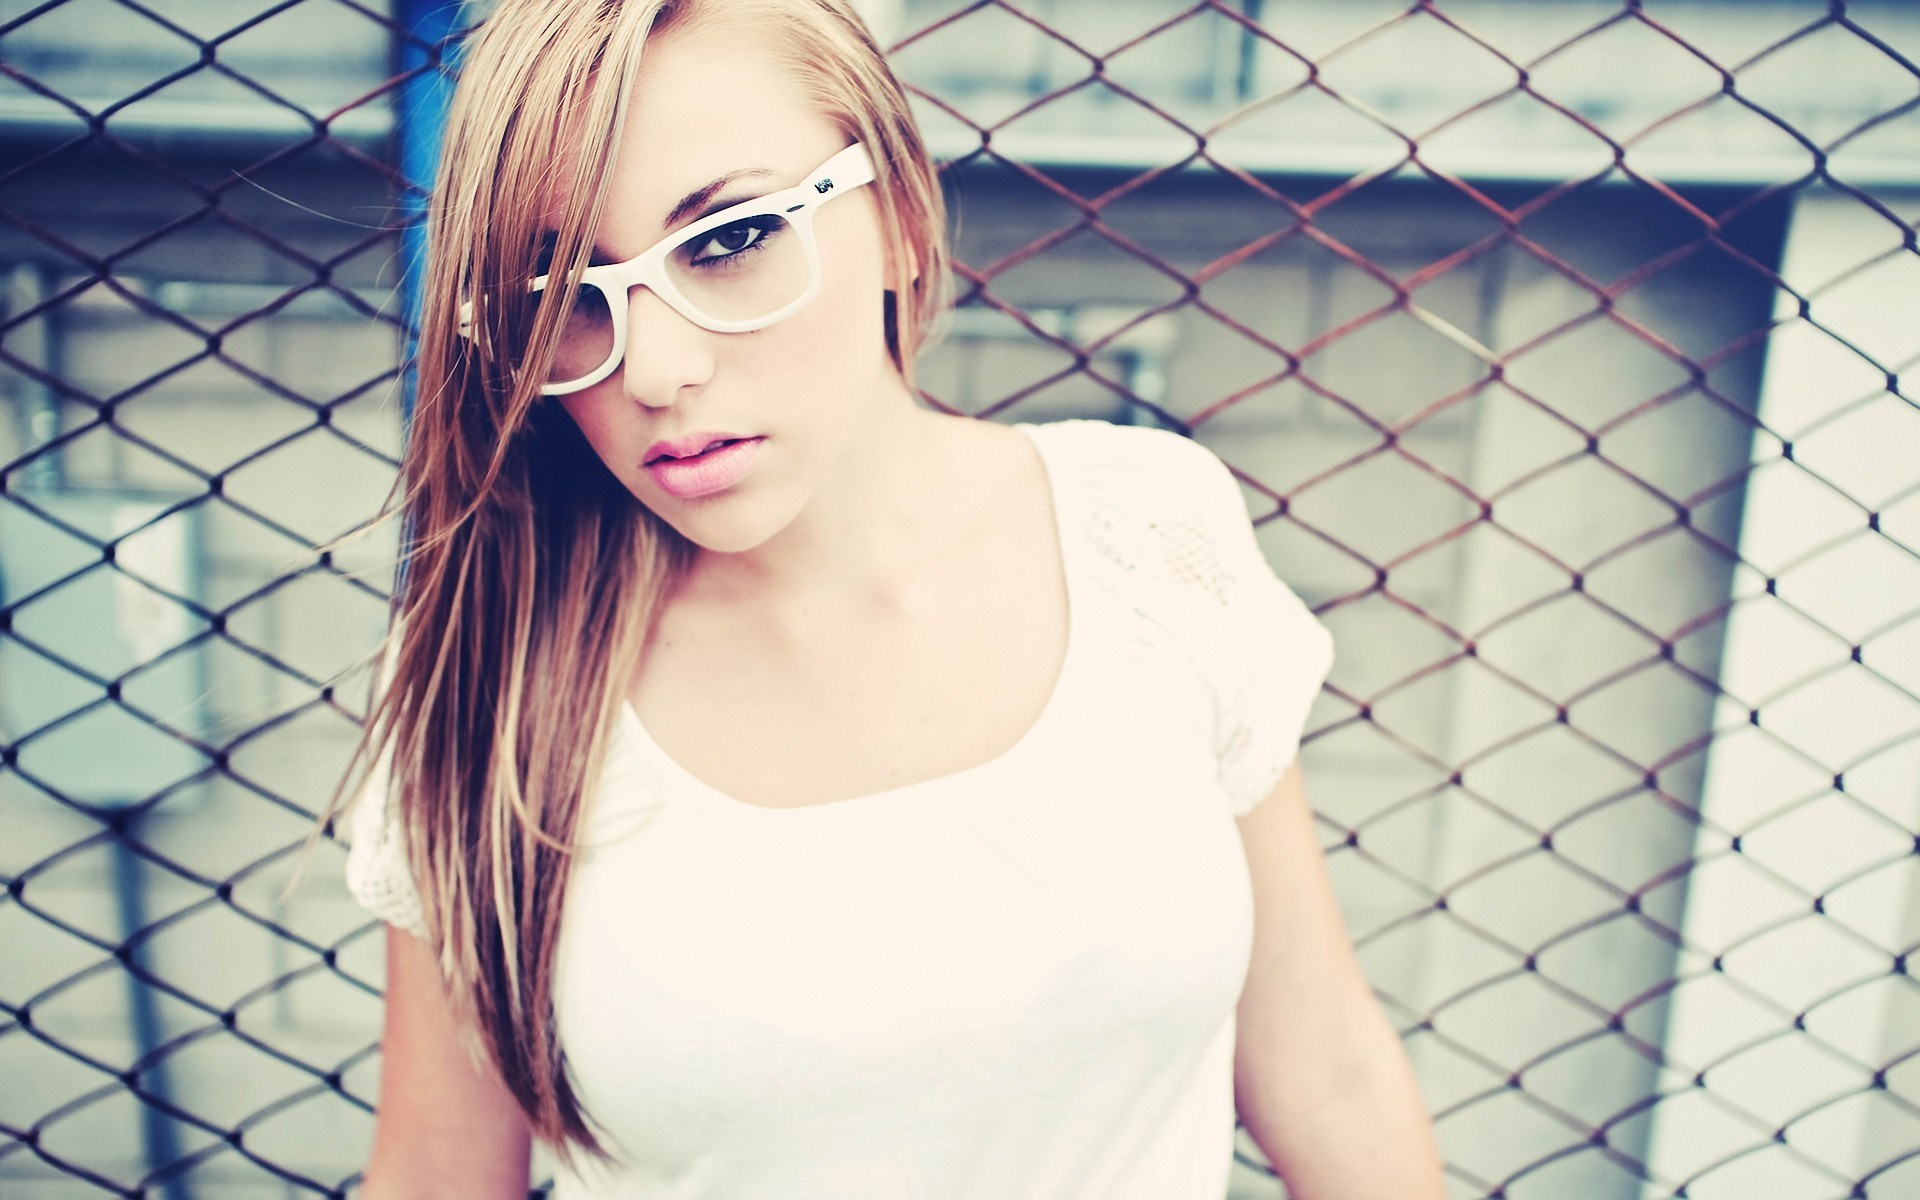 Fashion Model Girl Glasses